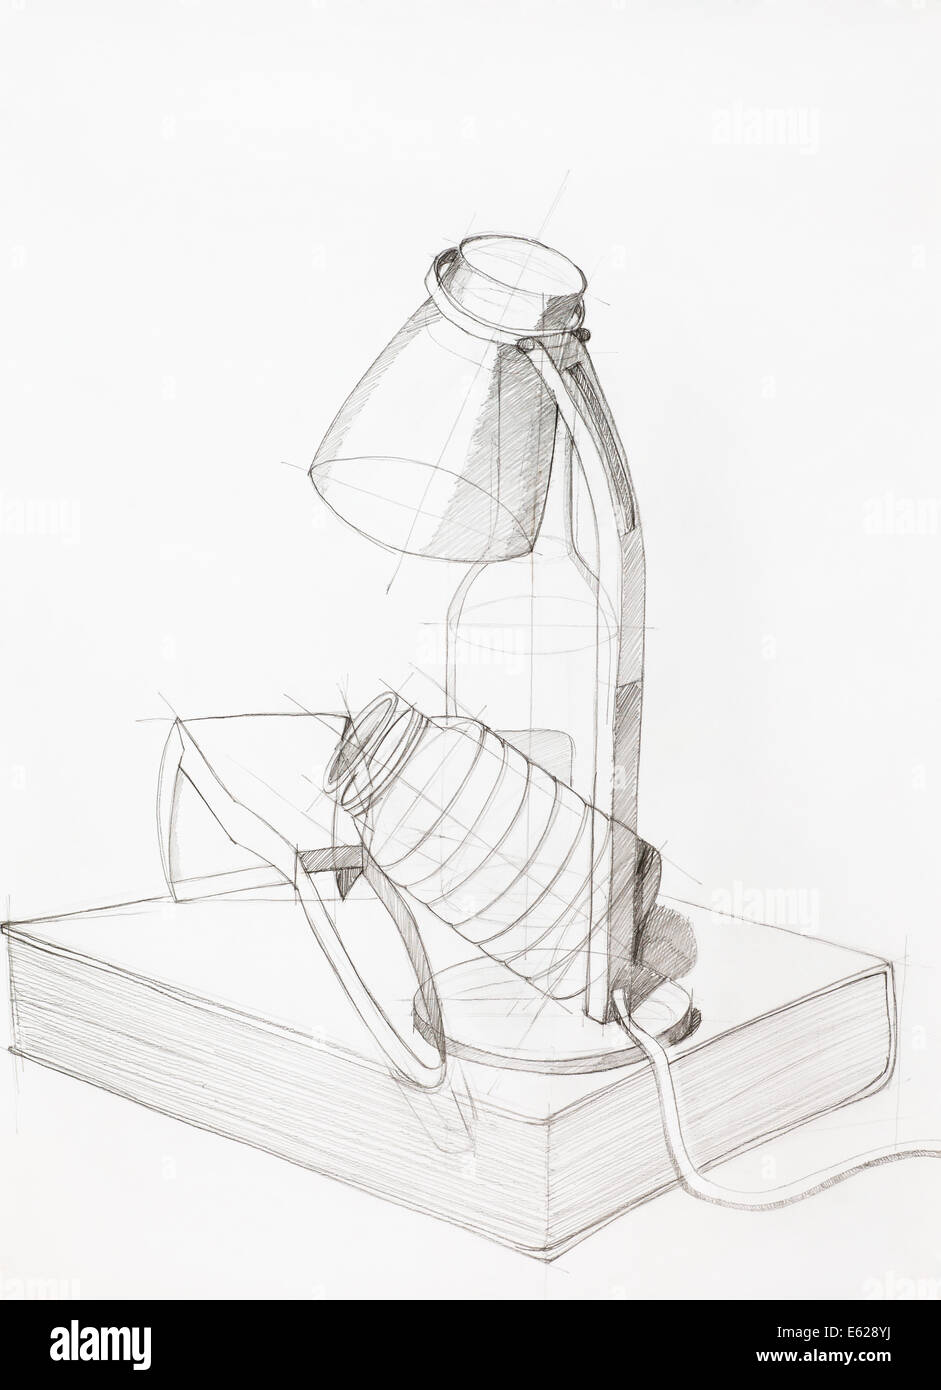 Estudiar composición artística dibujados a mano con objetos Imagen De Stock